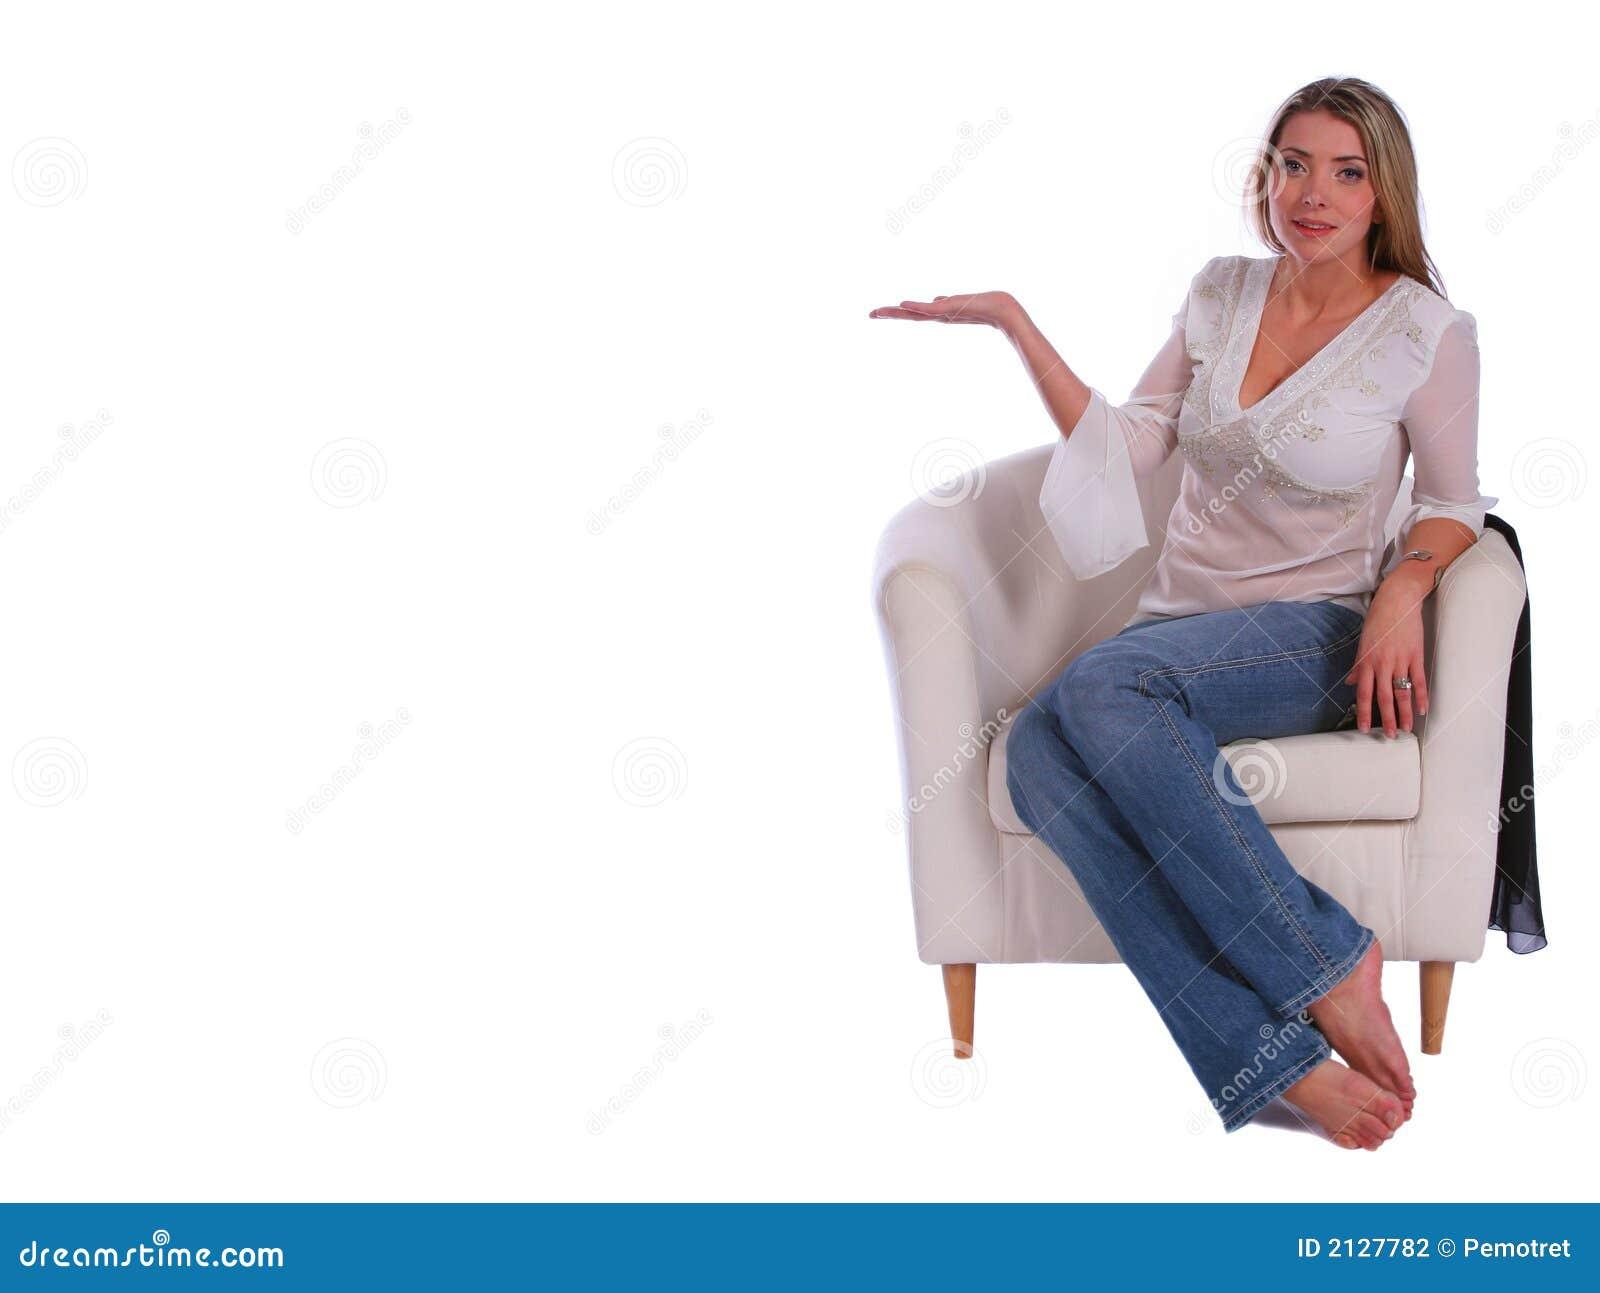 Sitting Promotion